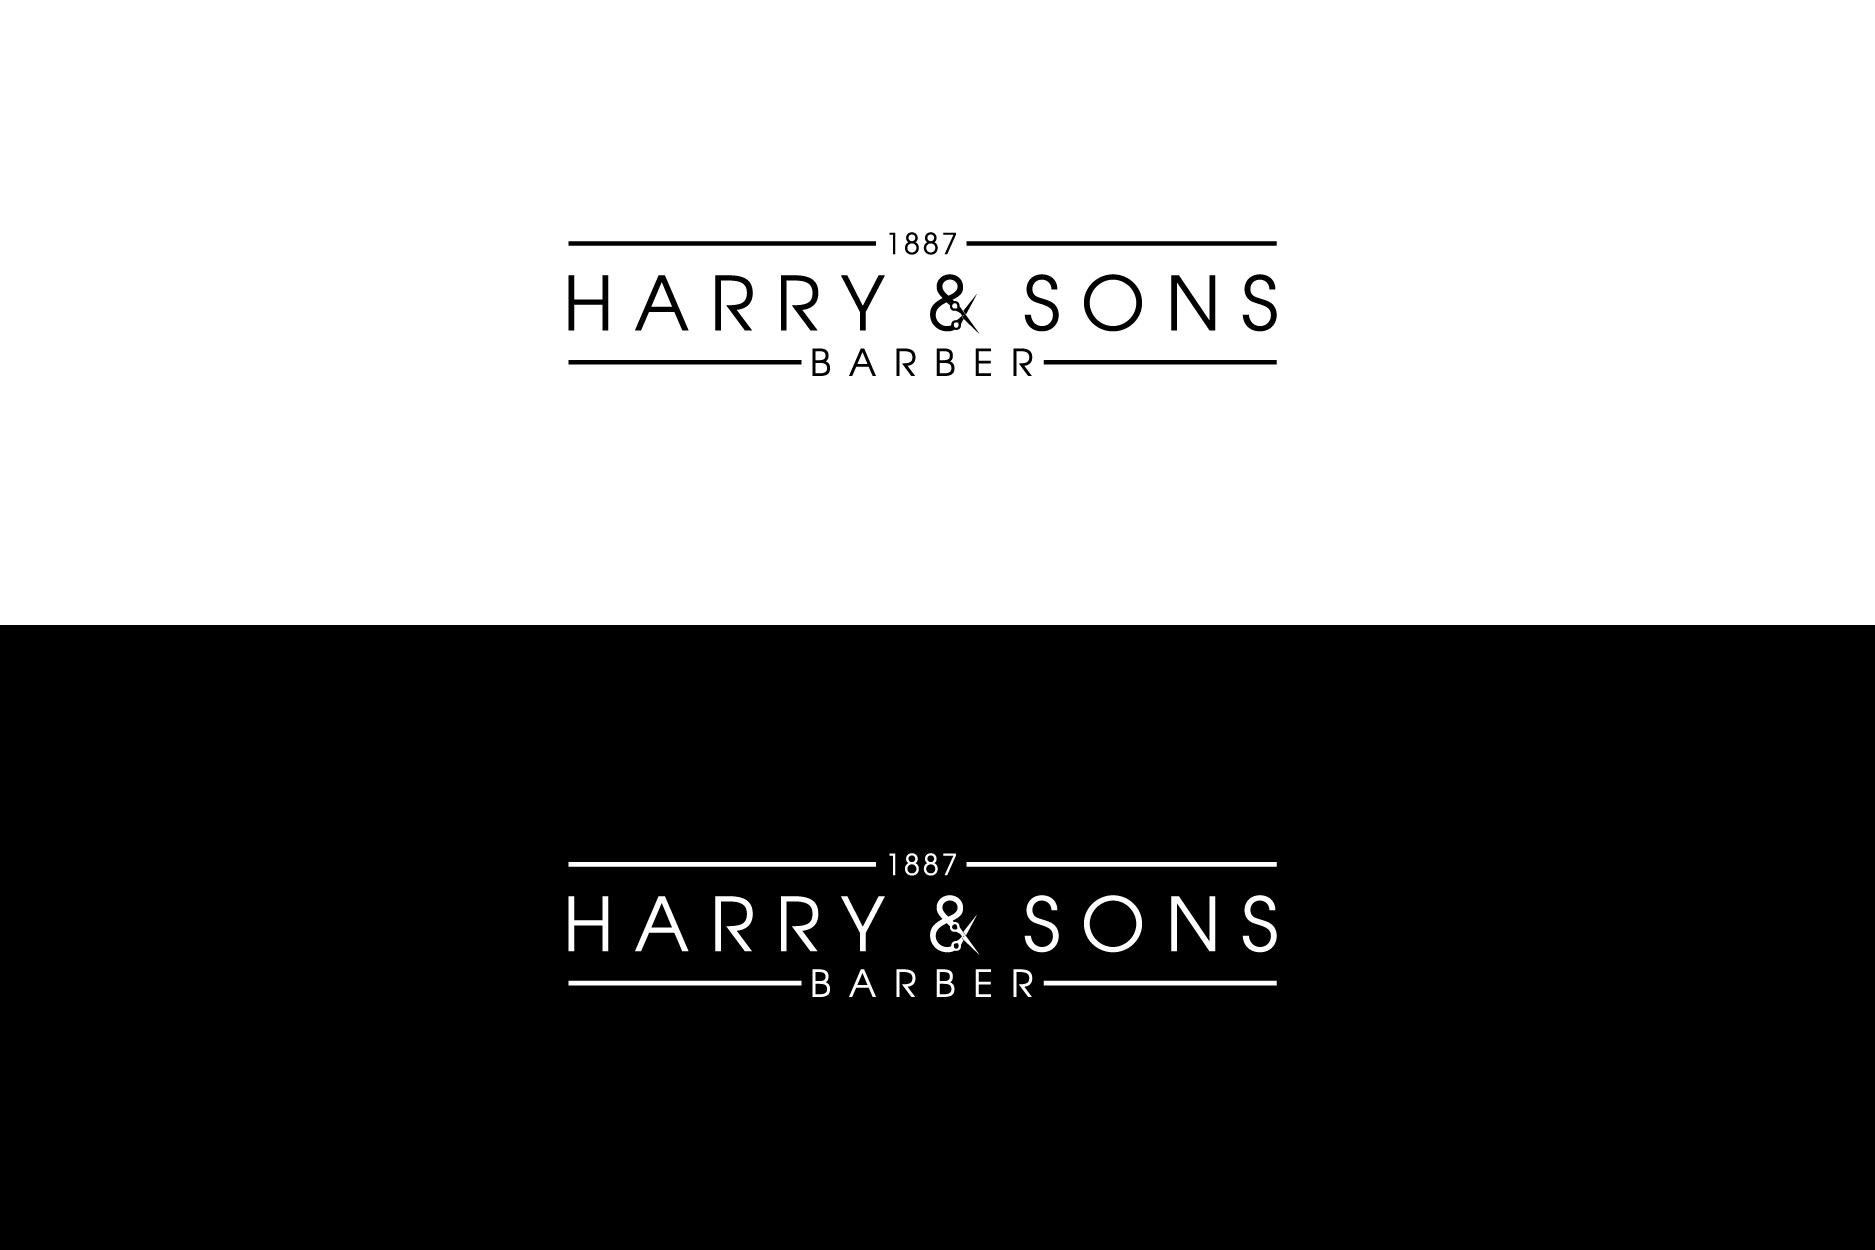 Logo Design by Shivaprasad Sangondimath - Entry No. 206 in the Logo Design Contest Captivating Logo Design for Harry and Sons Barber.